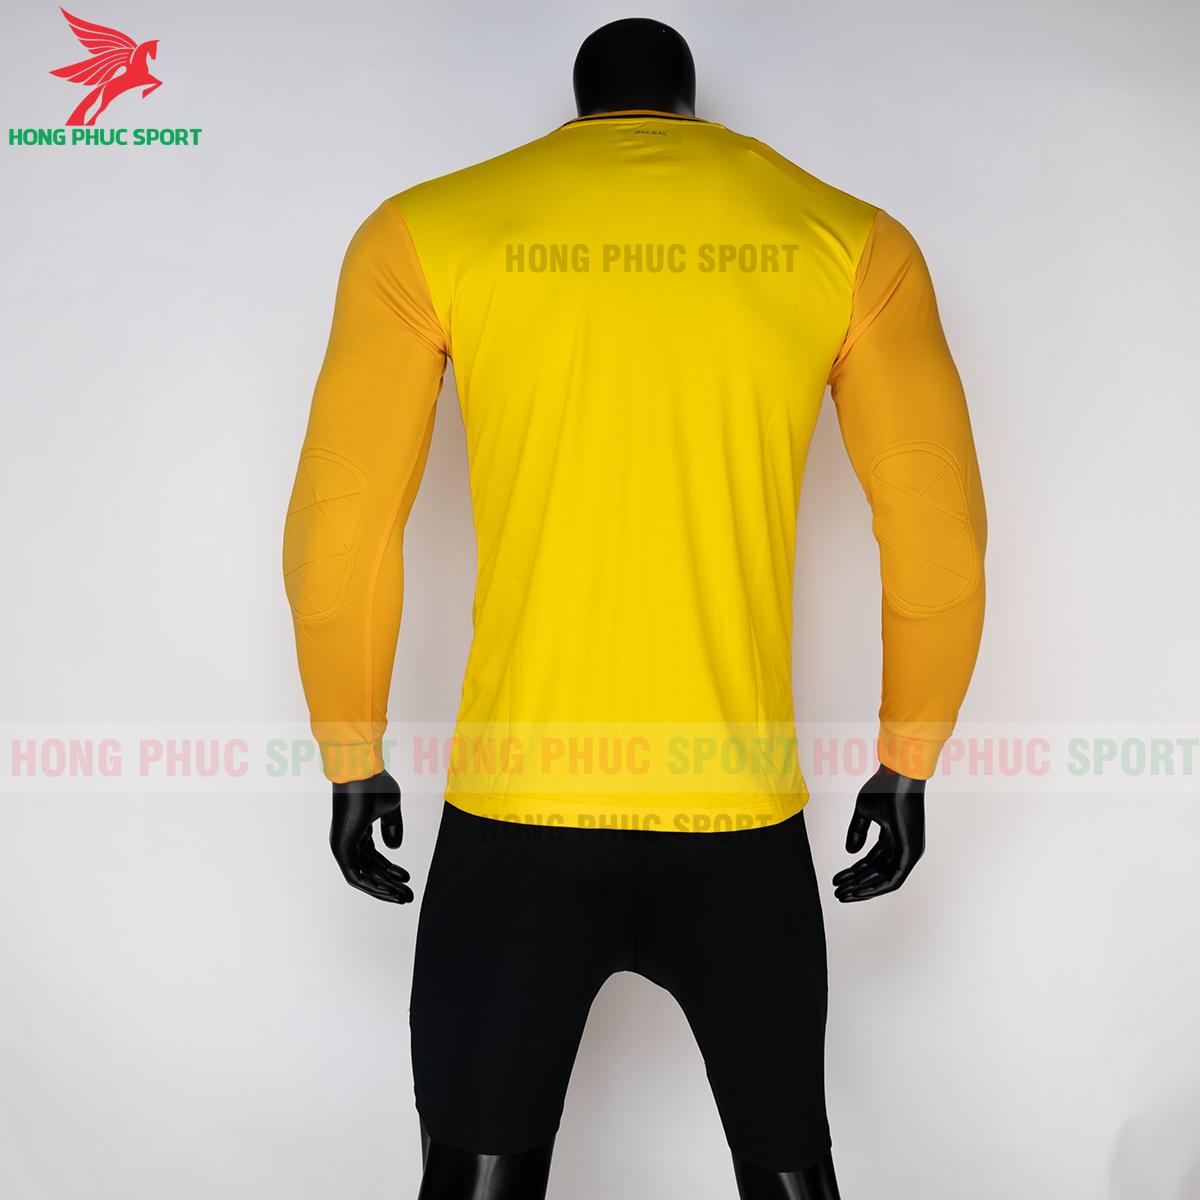 https://cdn.hongphucsport.com/unsafe/s4.shopbay.vn/files/285/ao-thu-mon-bulbal-2020-vang-6-5f72b045d2126.png